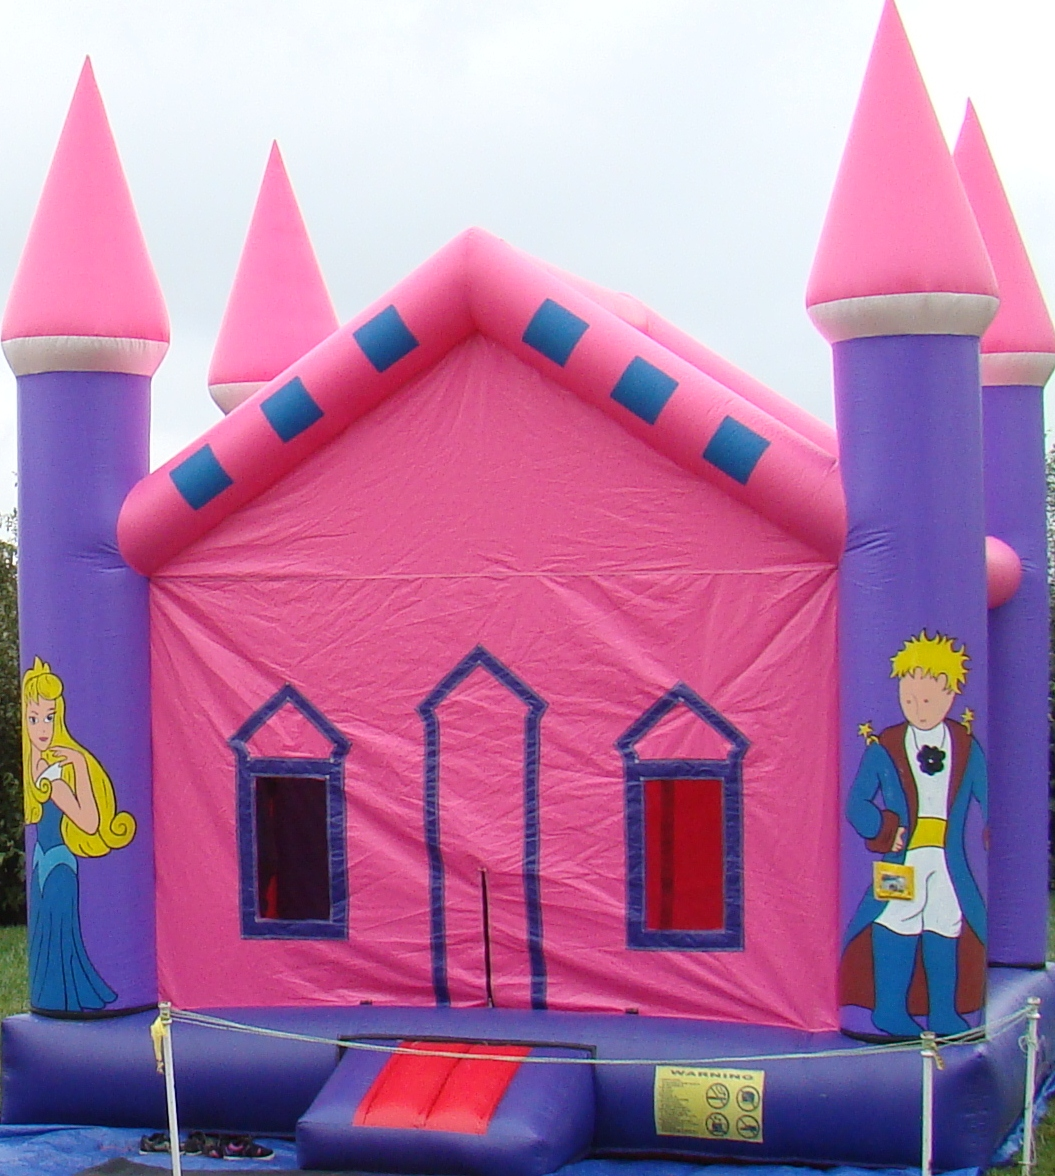 Inflatable Water Slide Rental Omaha: HoppyKidz Omaha Inflatable Rental Prices